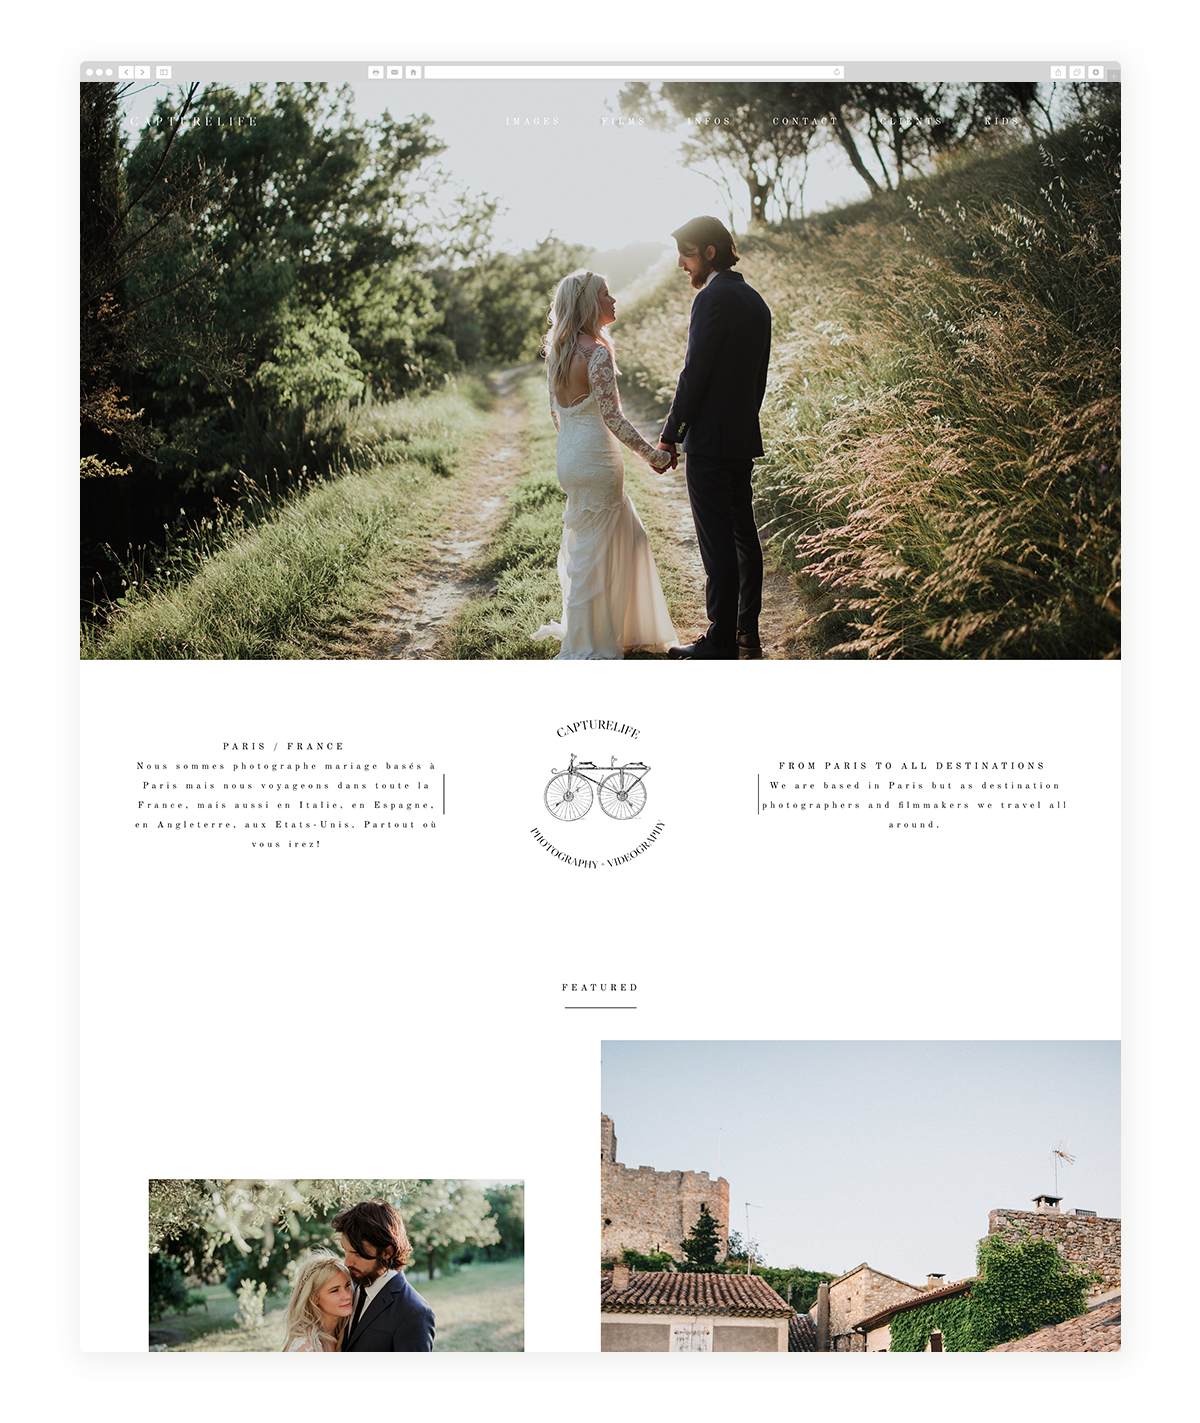 kyoto-website design, theme, wedding photography, site design, flothemes-capturelife-fr